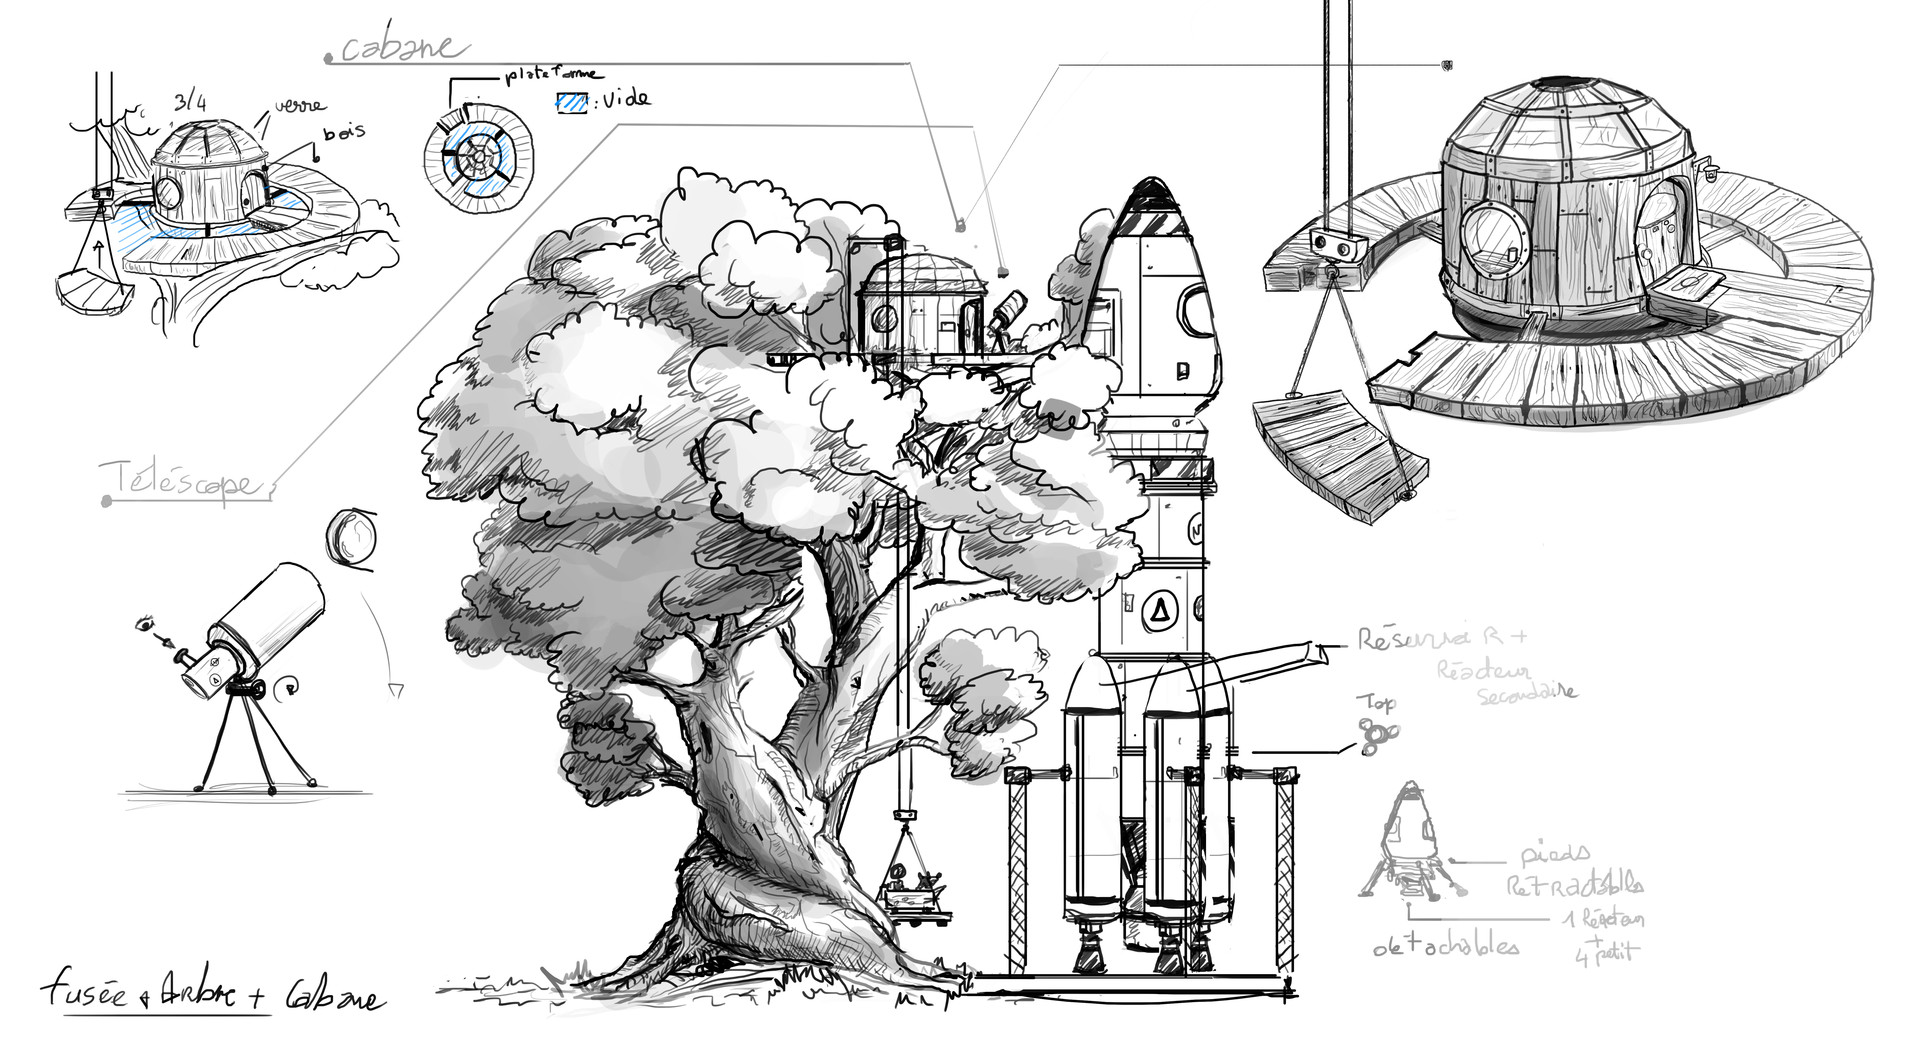 Gio gasparetto treehouse2